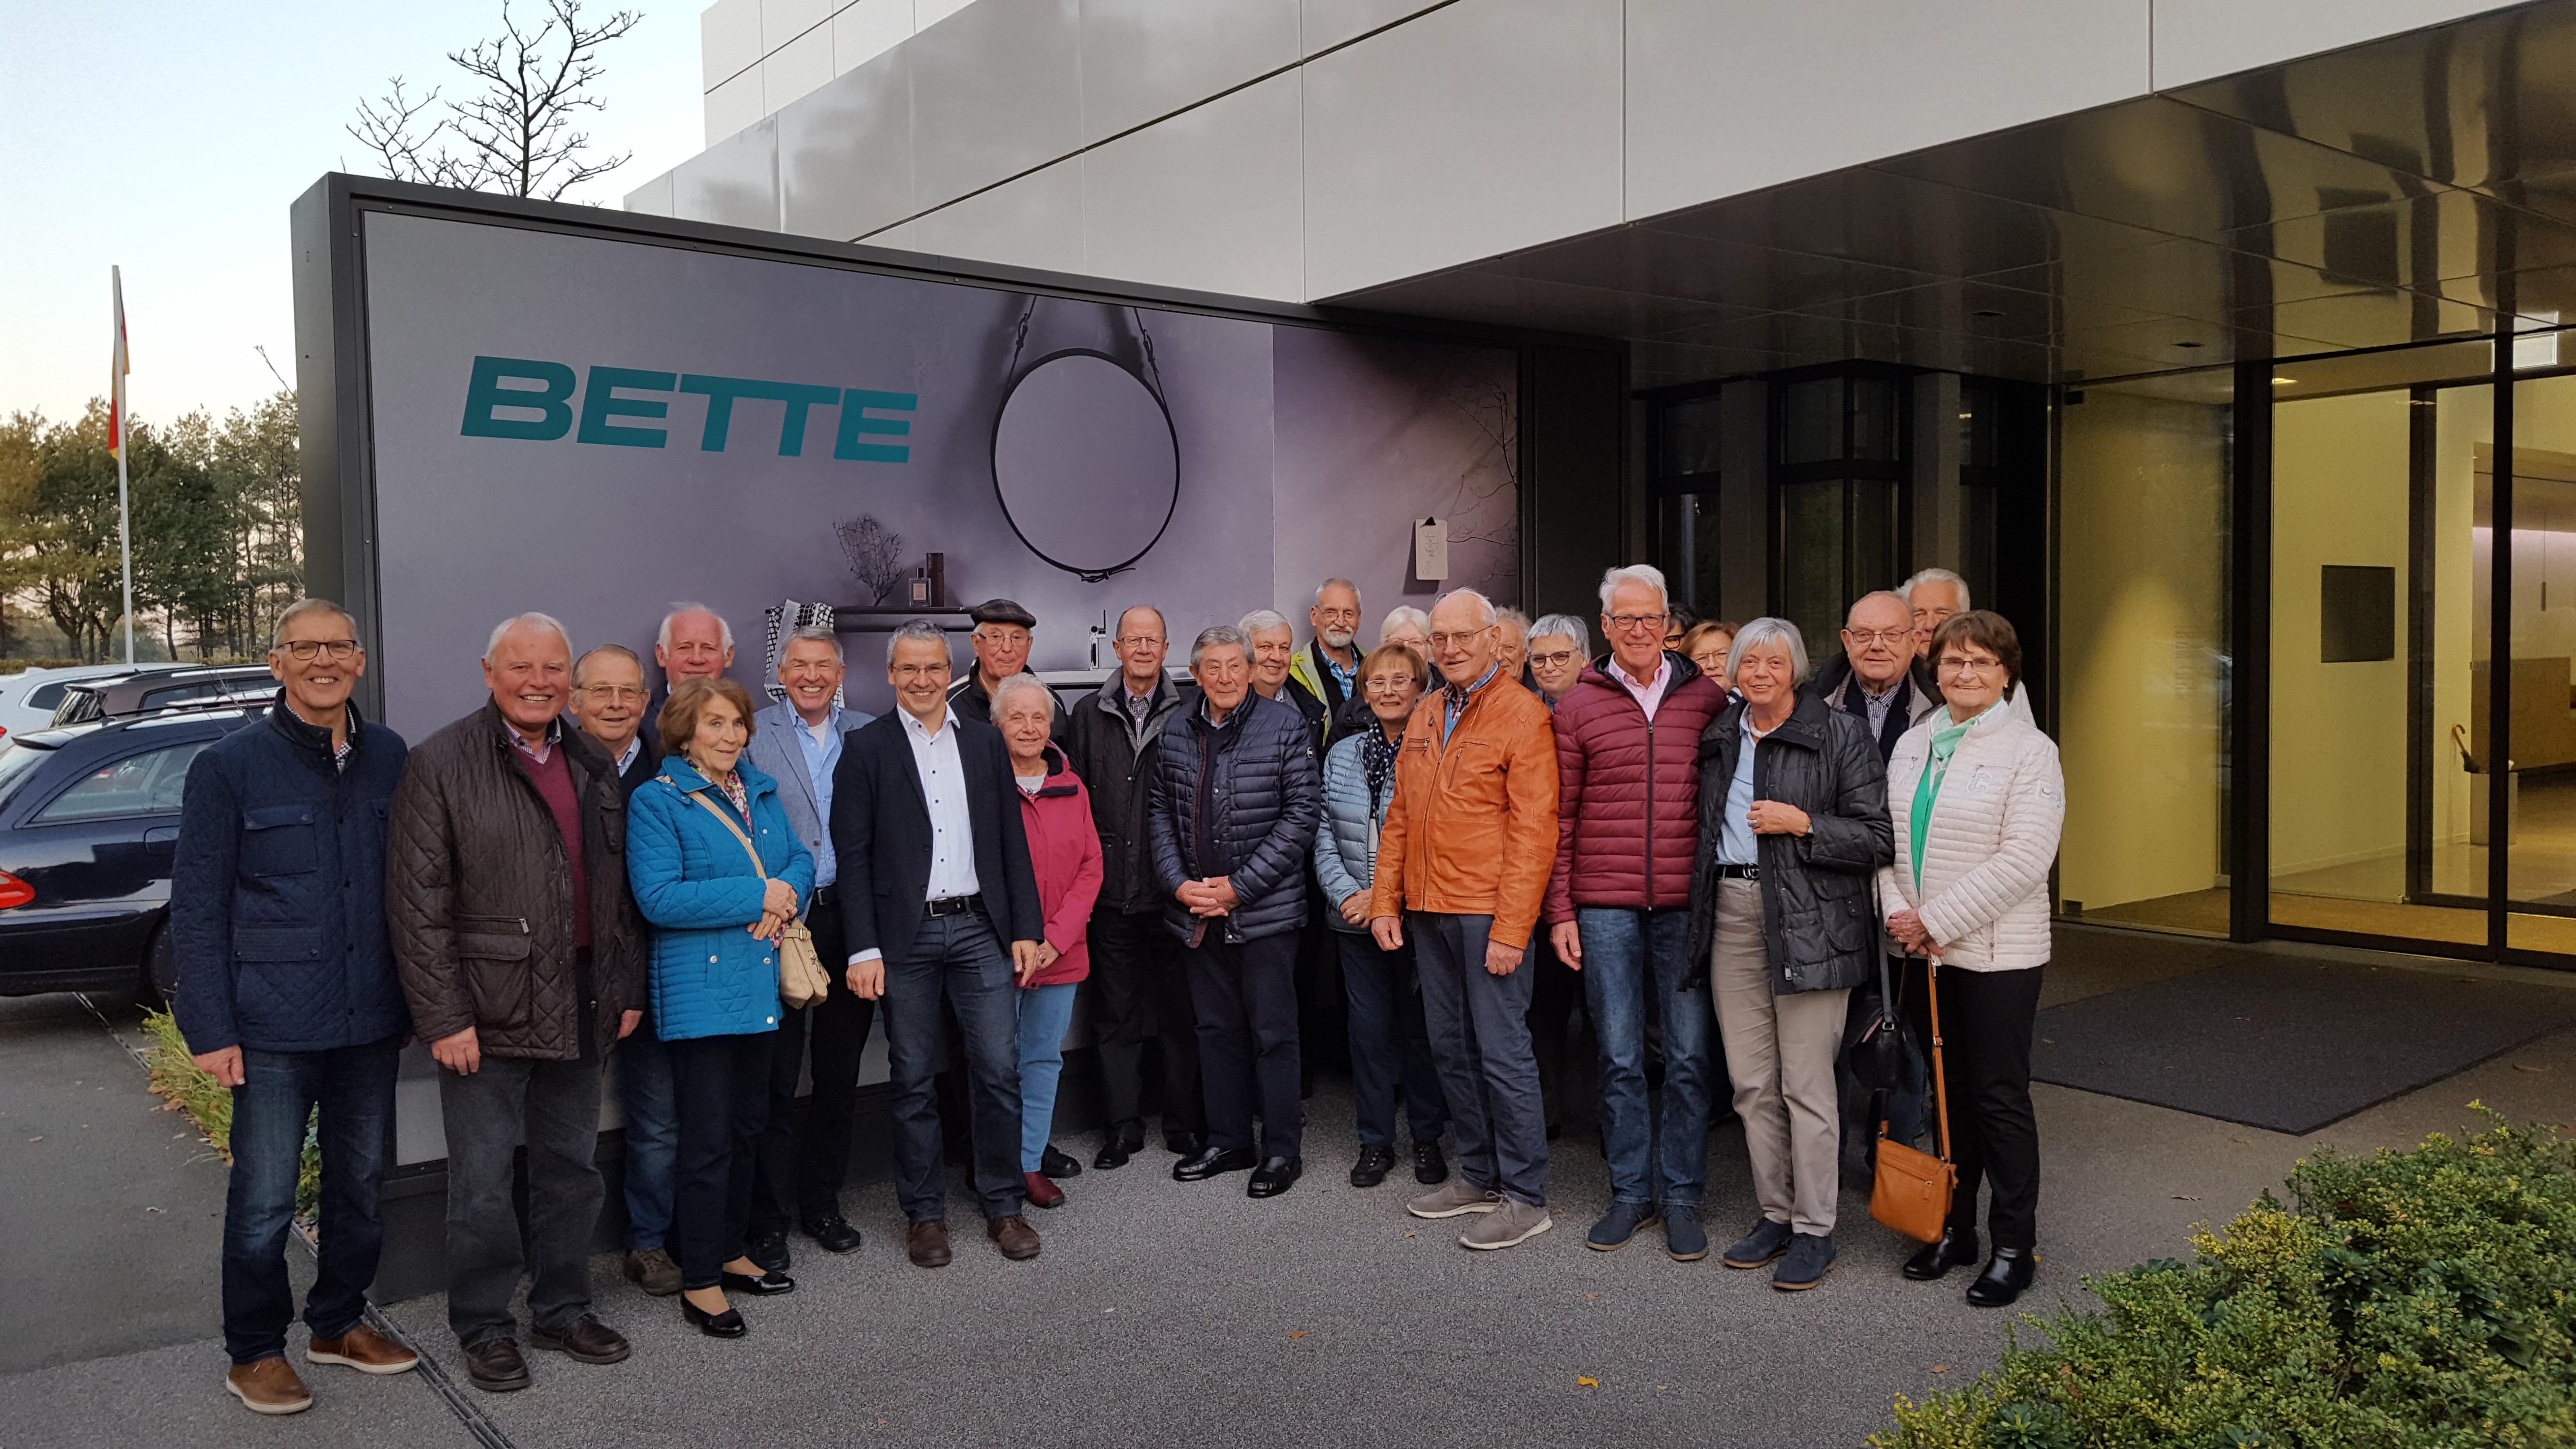 31.10.19 – Die Seniorenunion zu Gast bei der Fa Bette GmbH & Co. KG in Delbrück